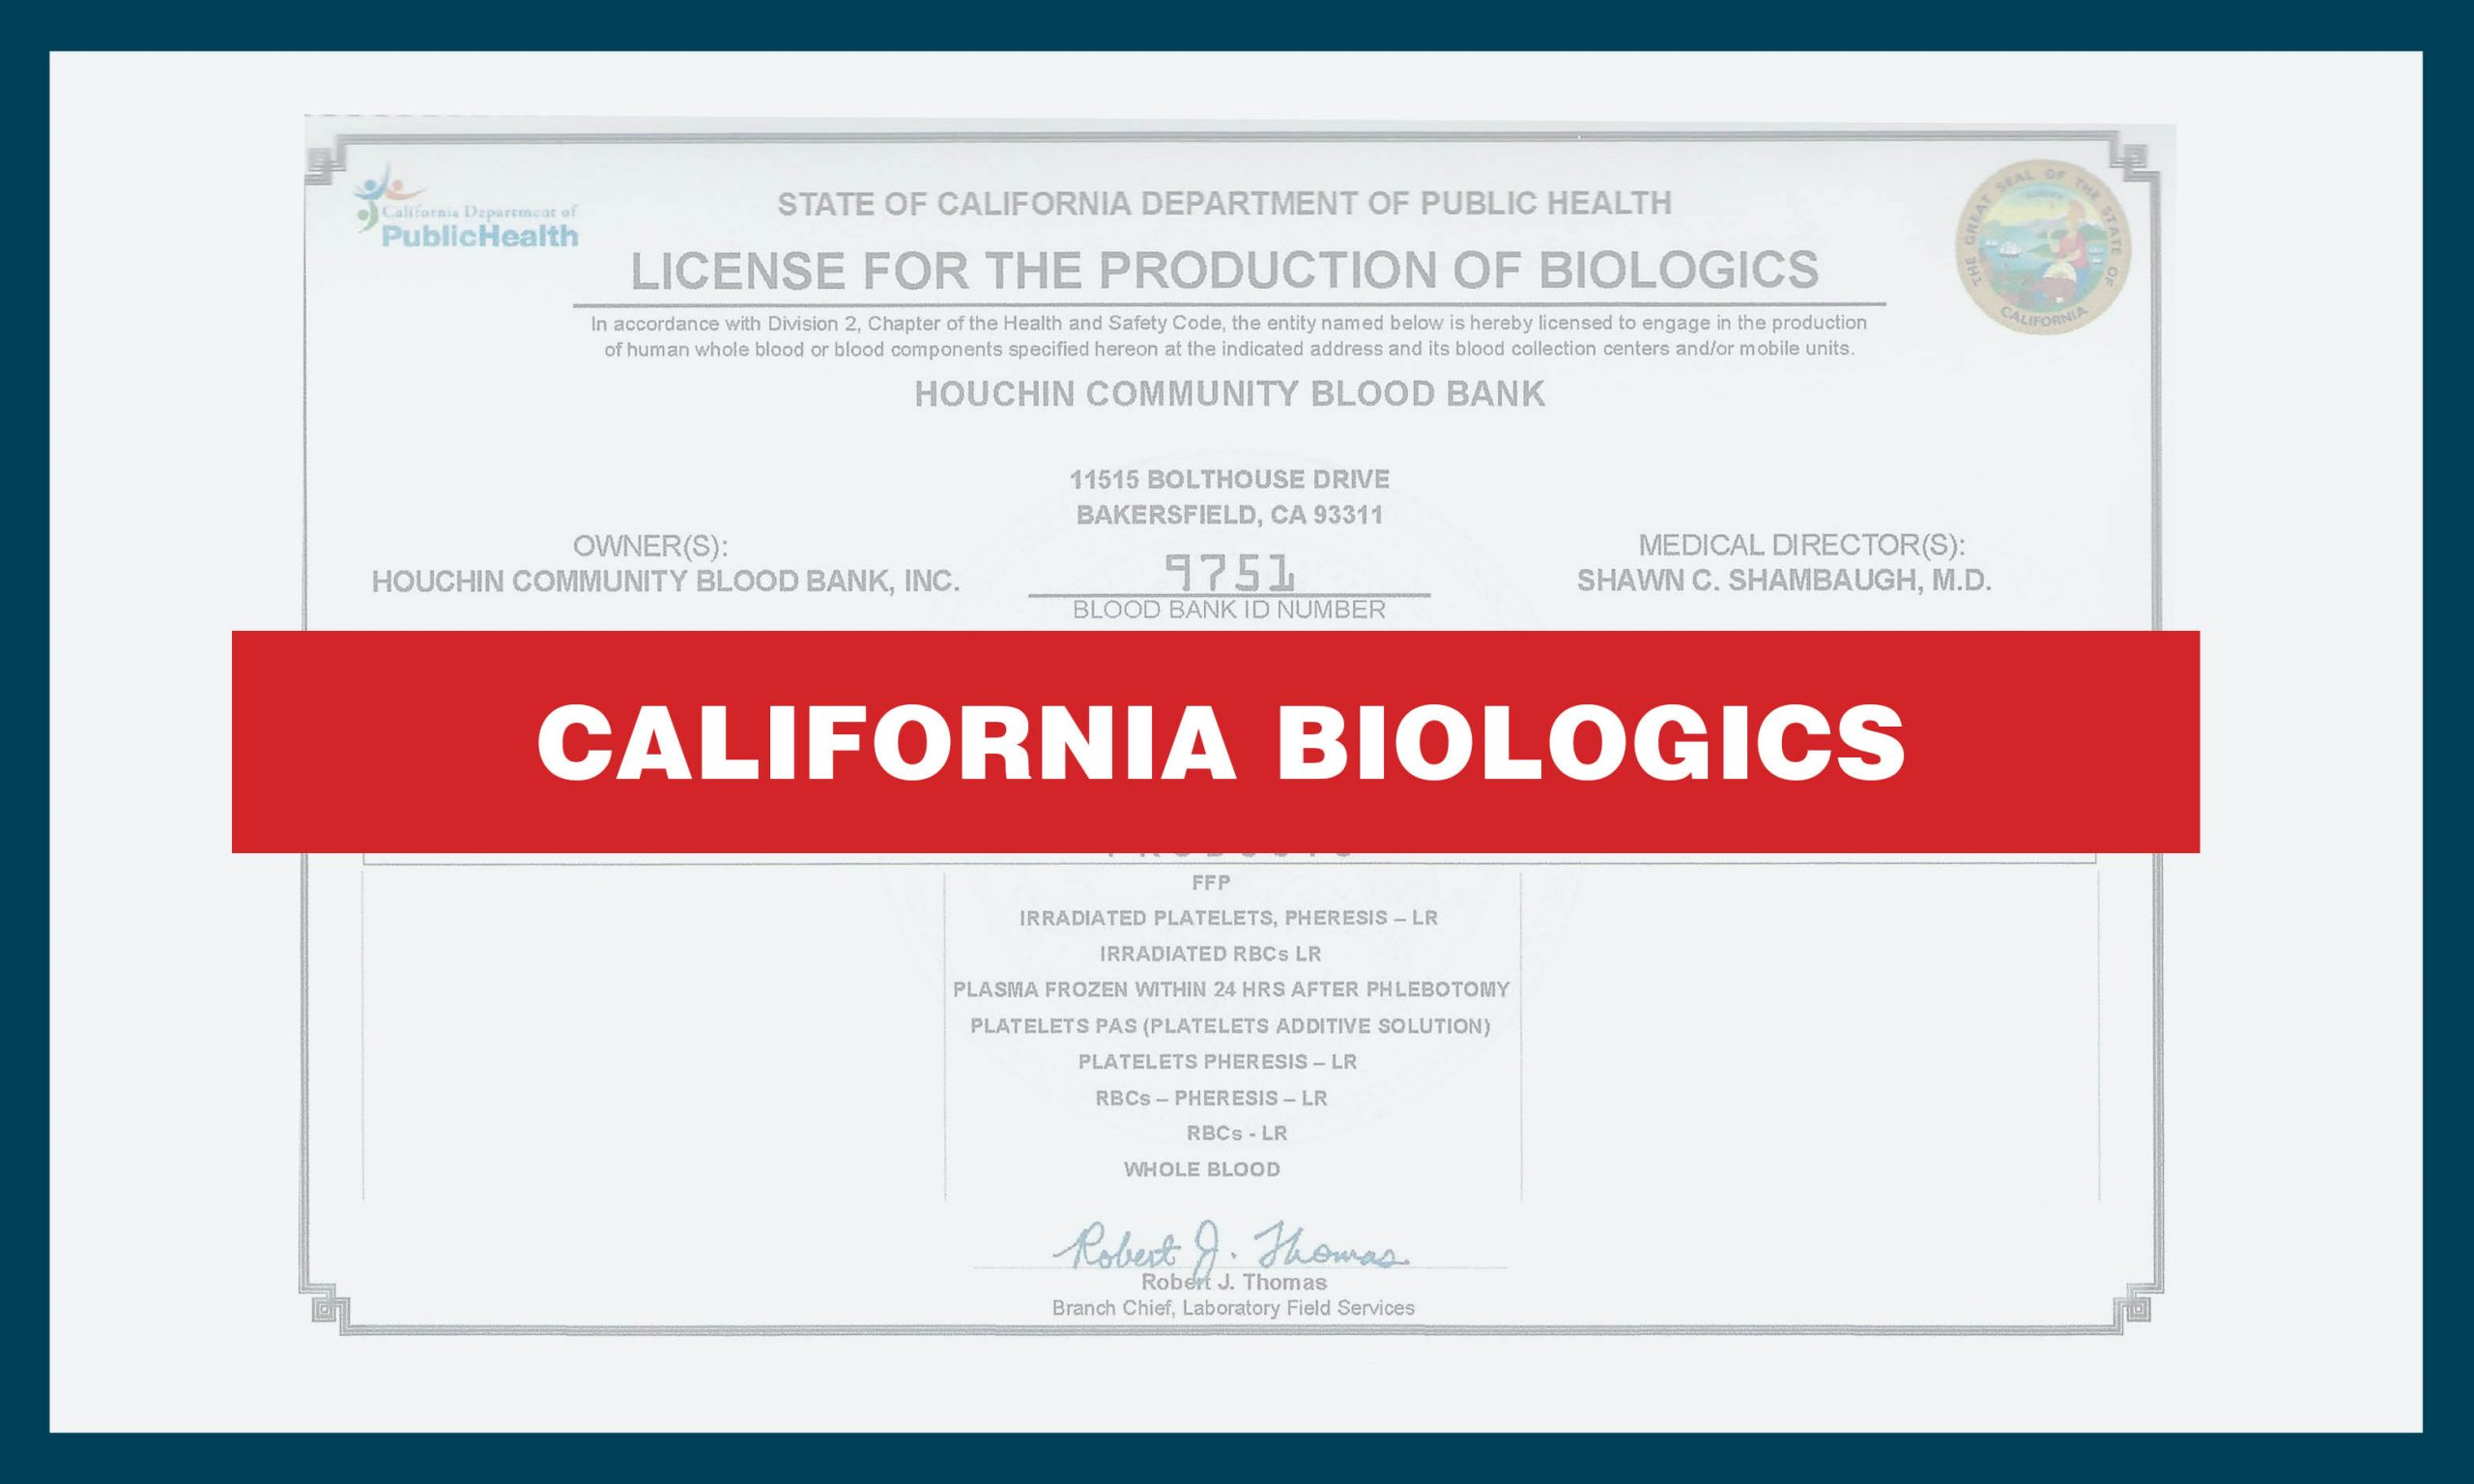 2019-California_Biologics_license_